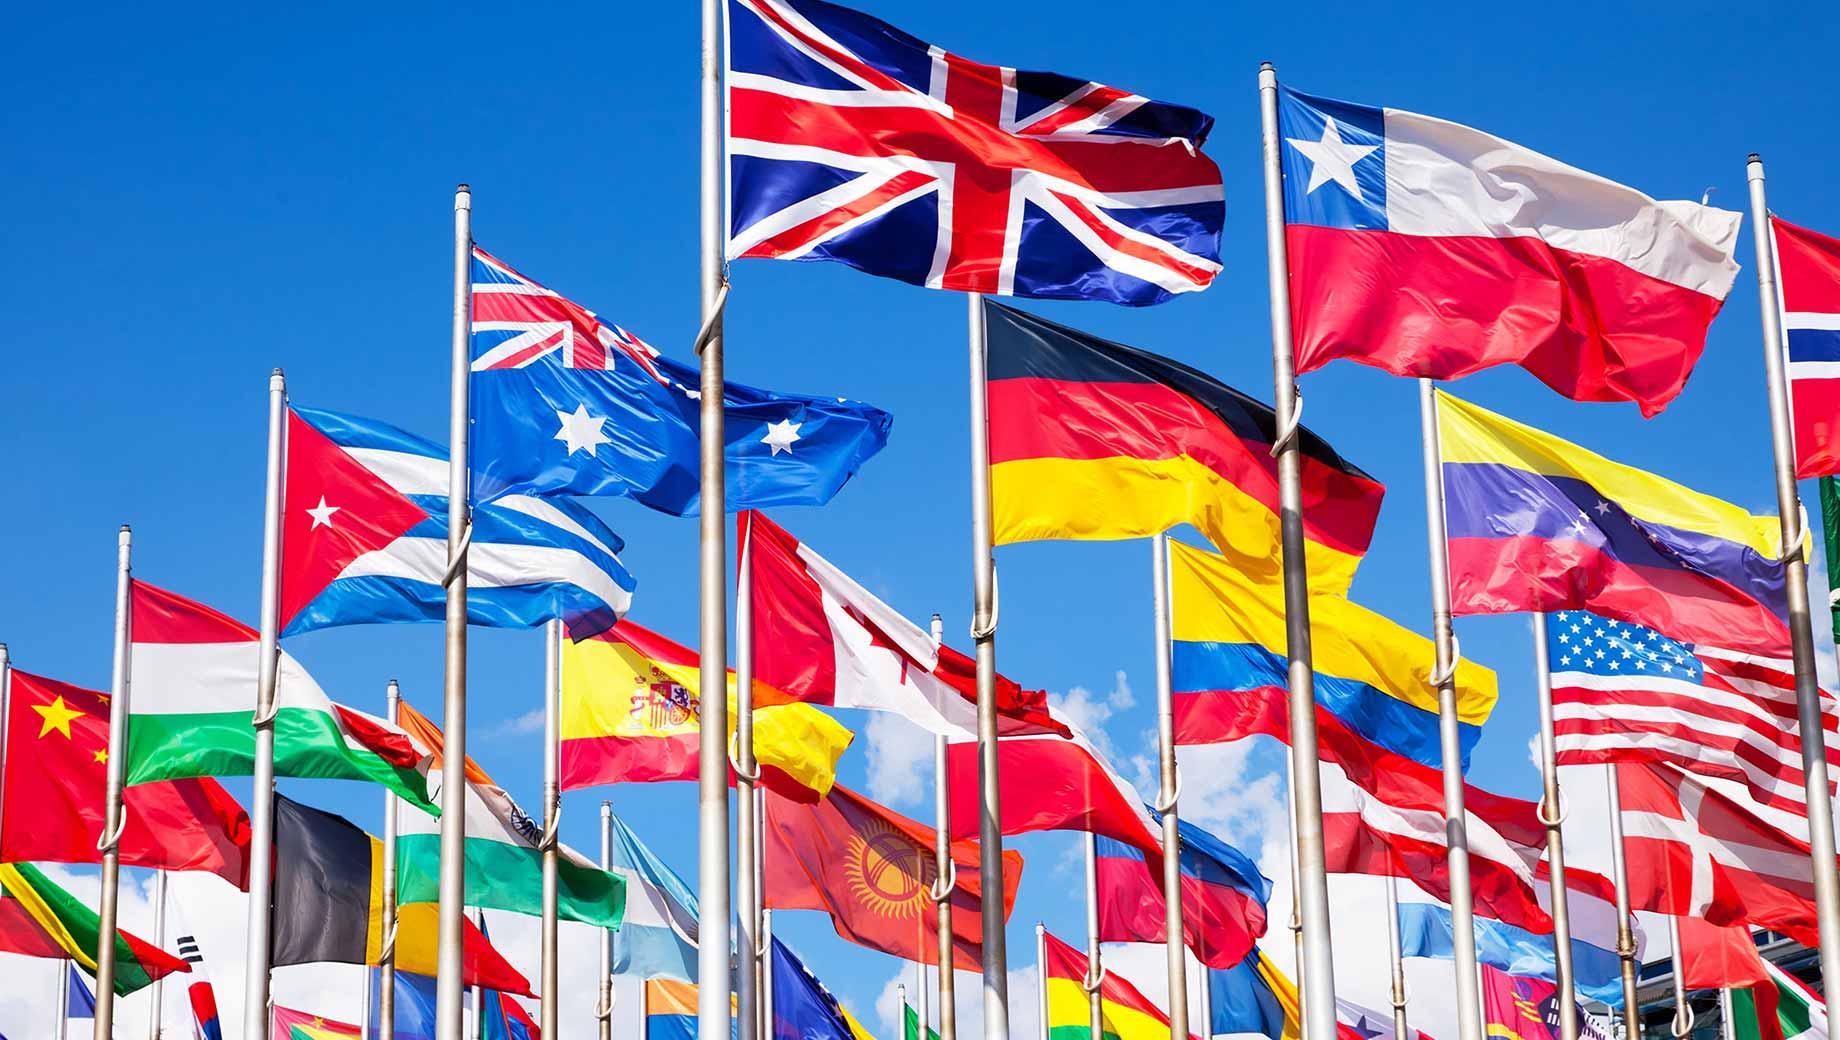 U.S. Leadership Remains Unpopular Worldwide